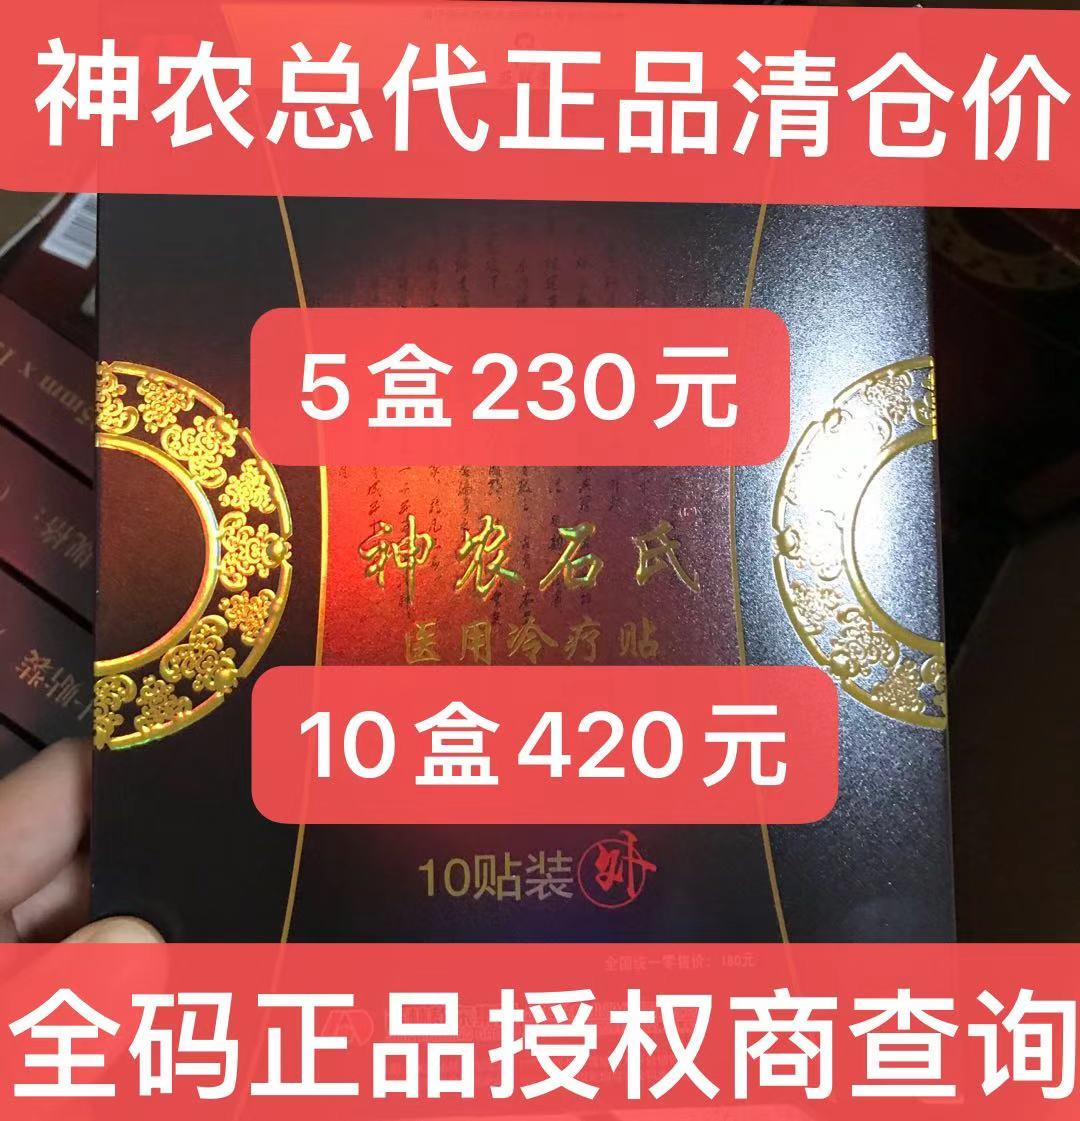 Jilin Aodong Shennong Shishi cold treatment paste Chen Jun Tang Di Sheng Tang tendon and bone health care paste cold compress paste new packaging authentic